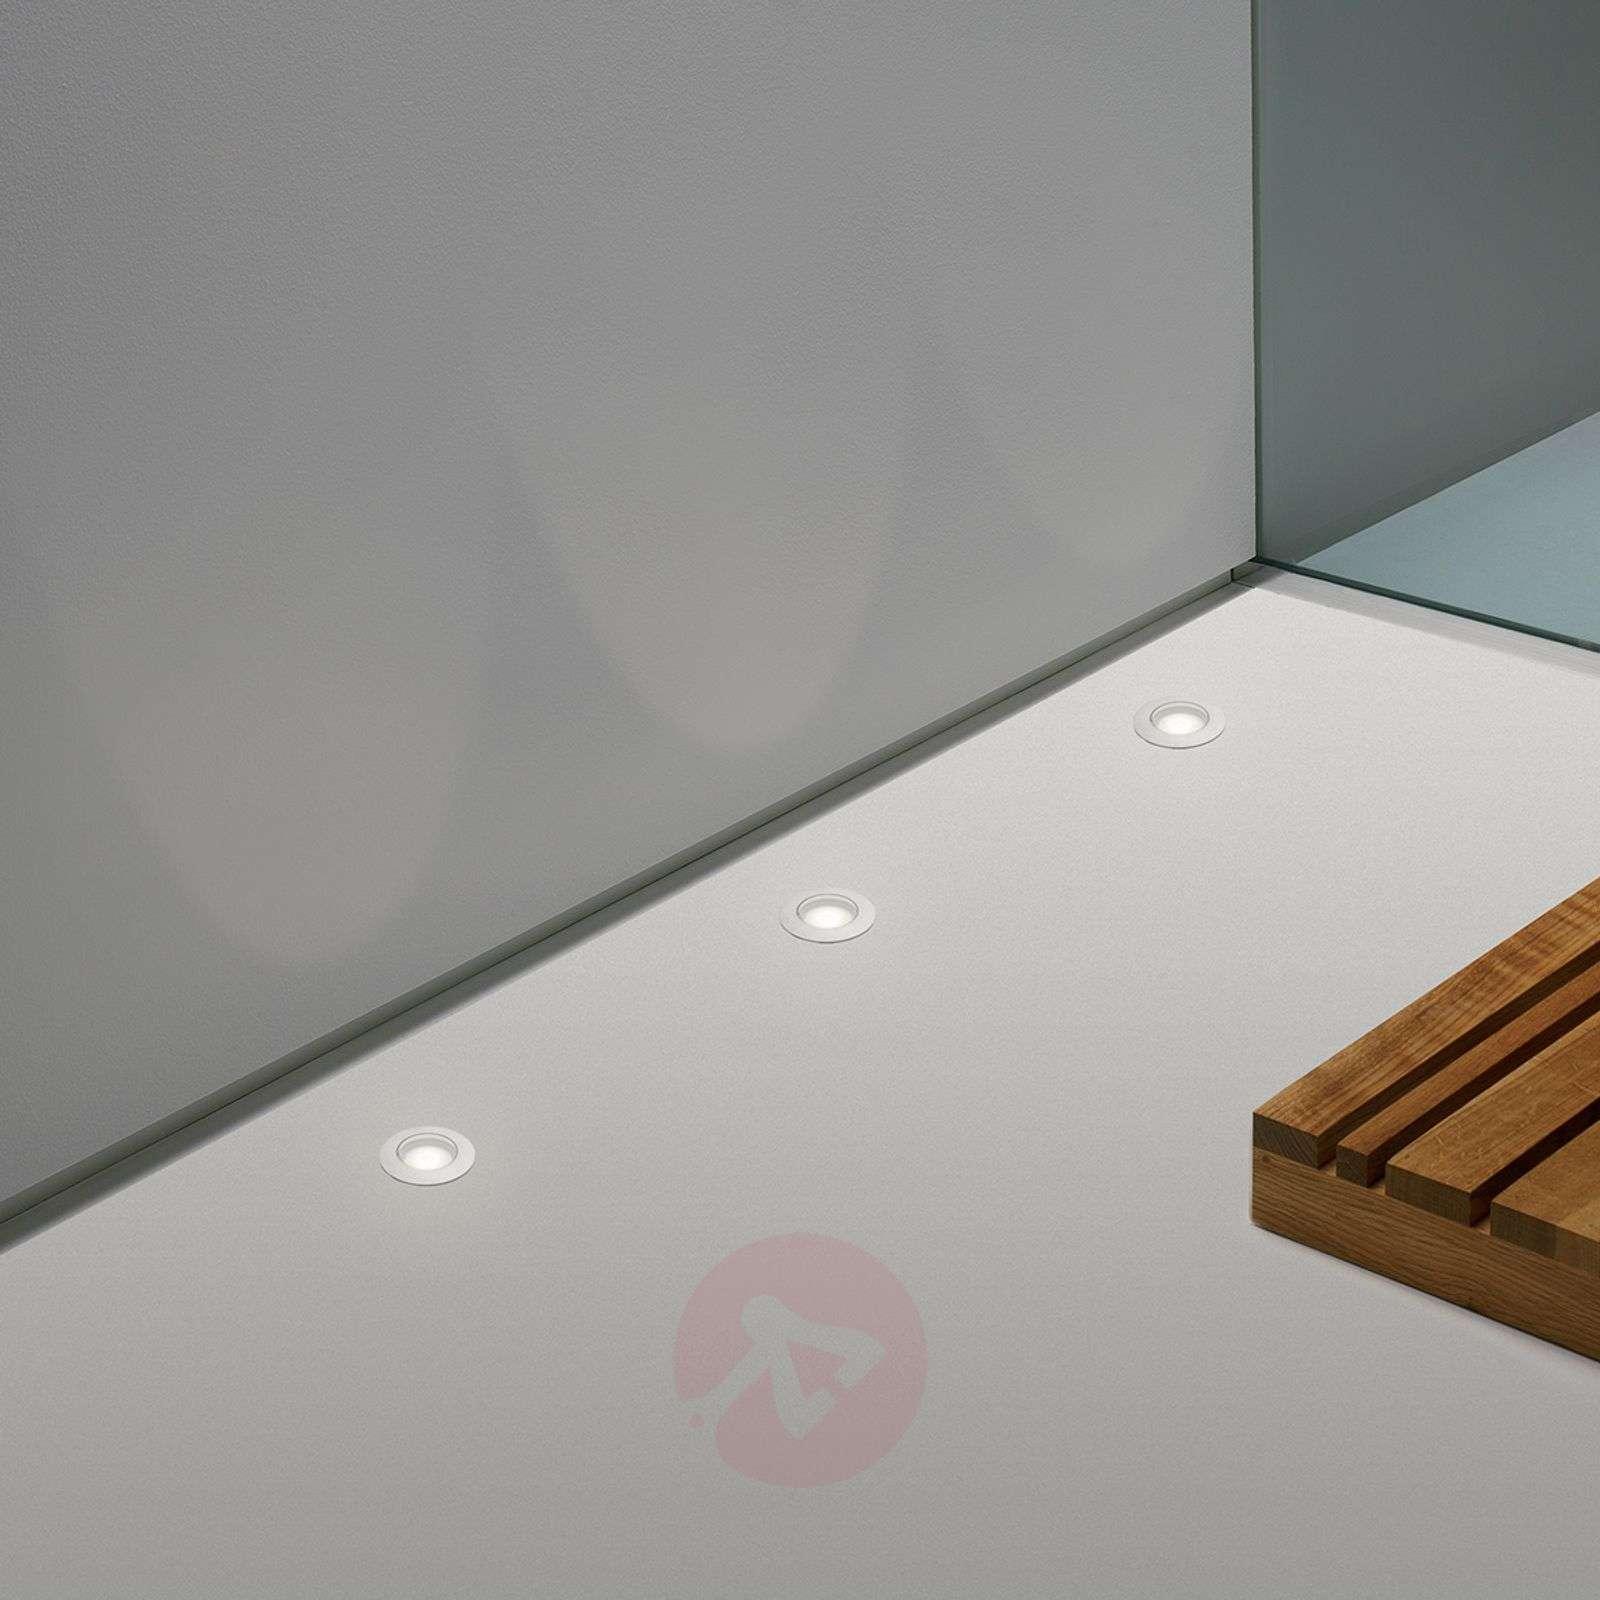 Terra 42 LED Built-In Bathroom Spotlight with IP67-1020459-03